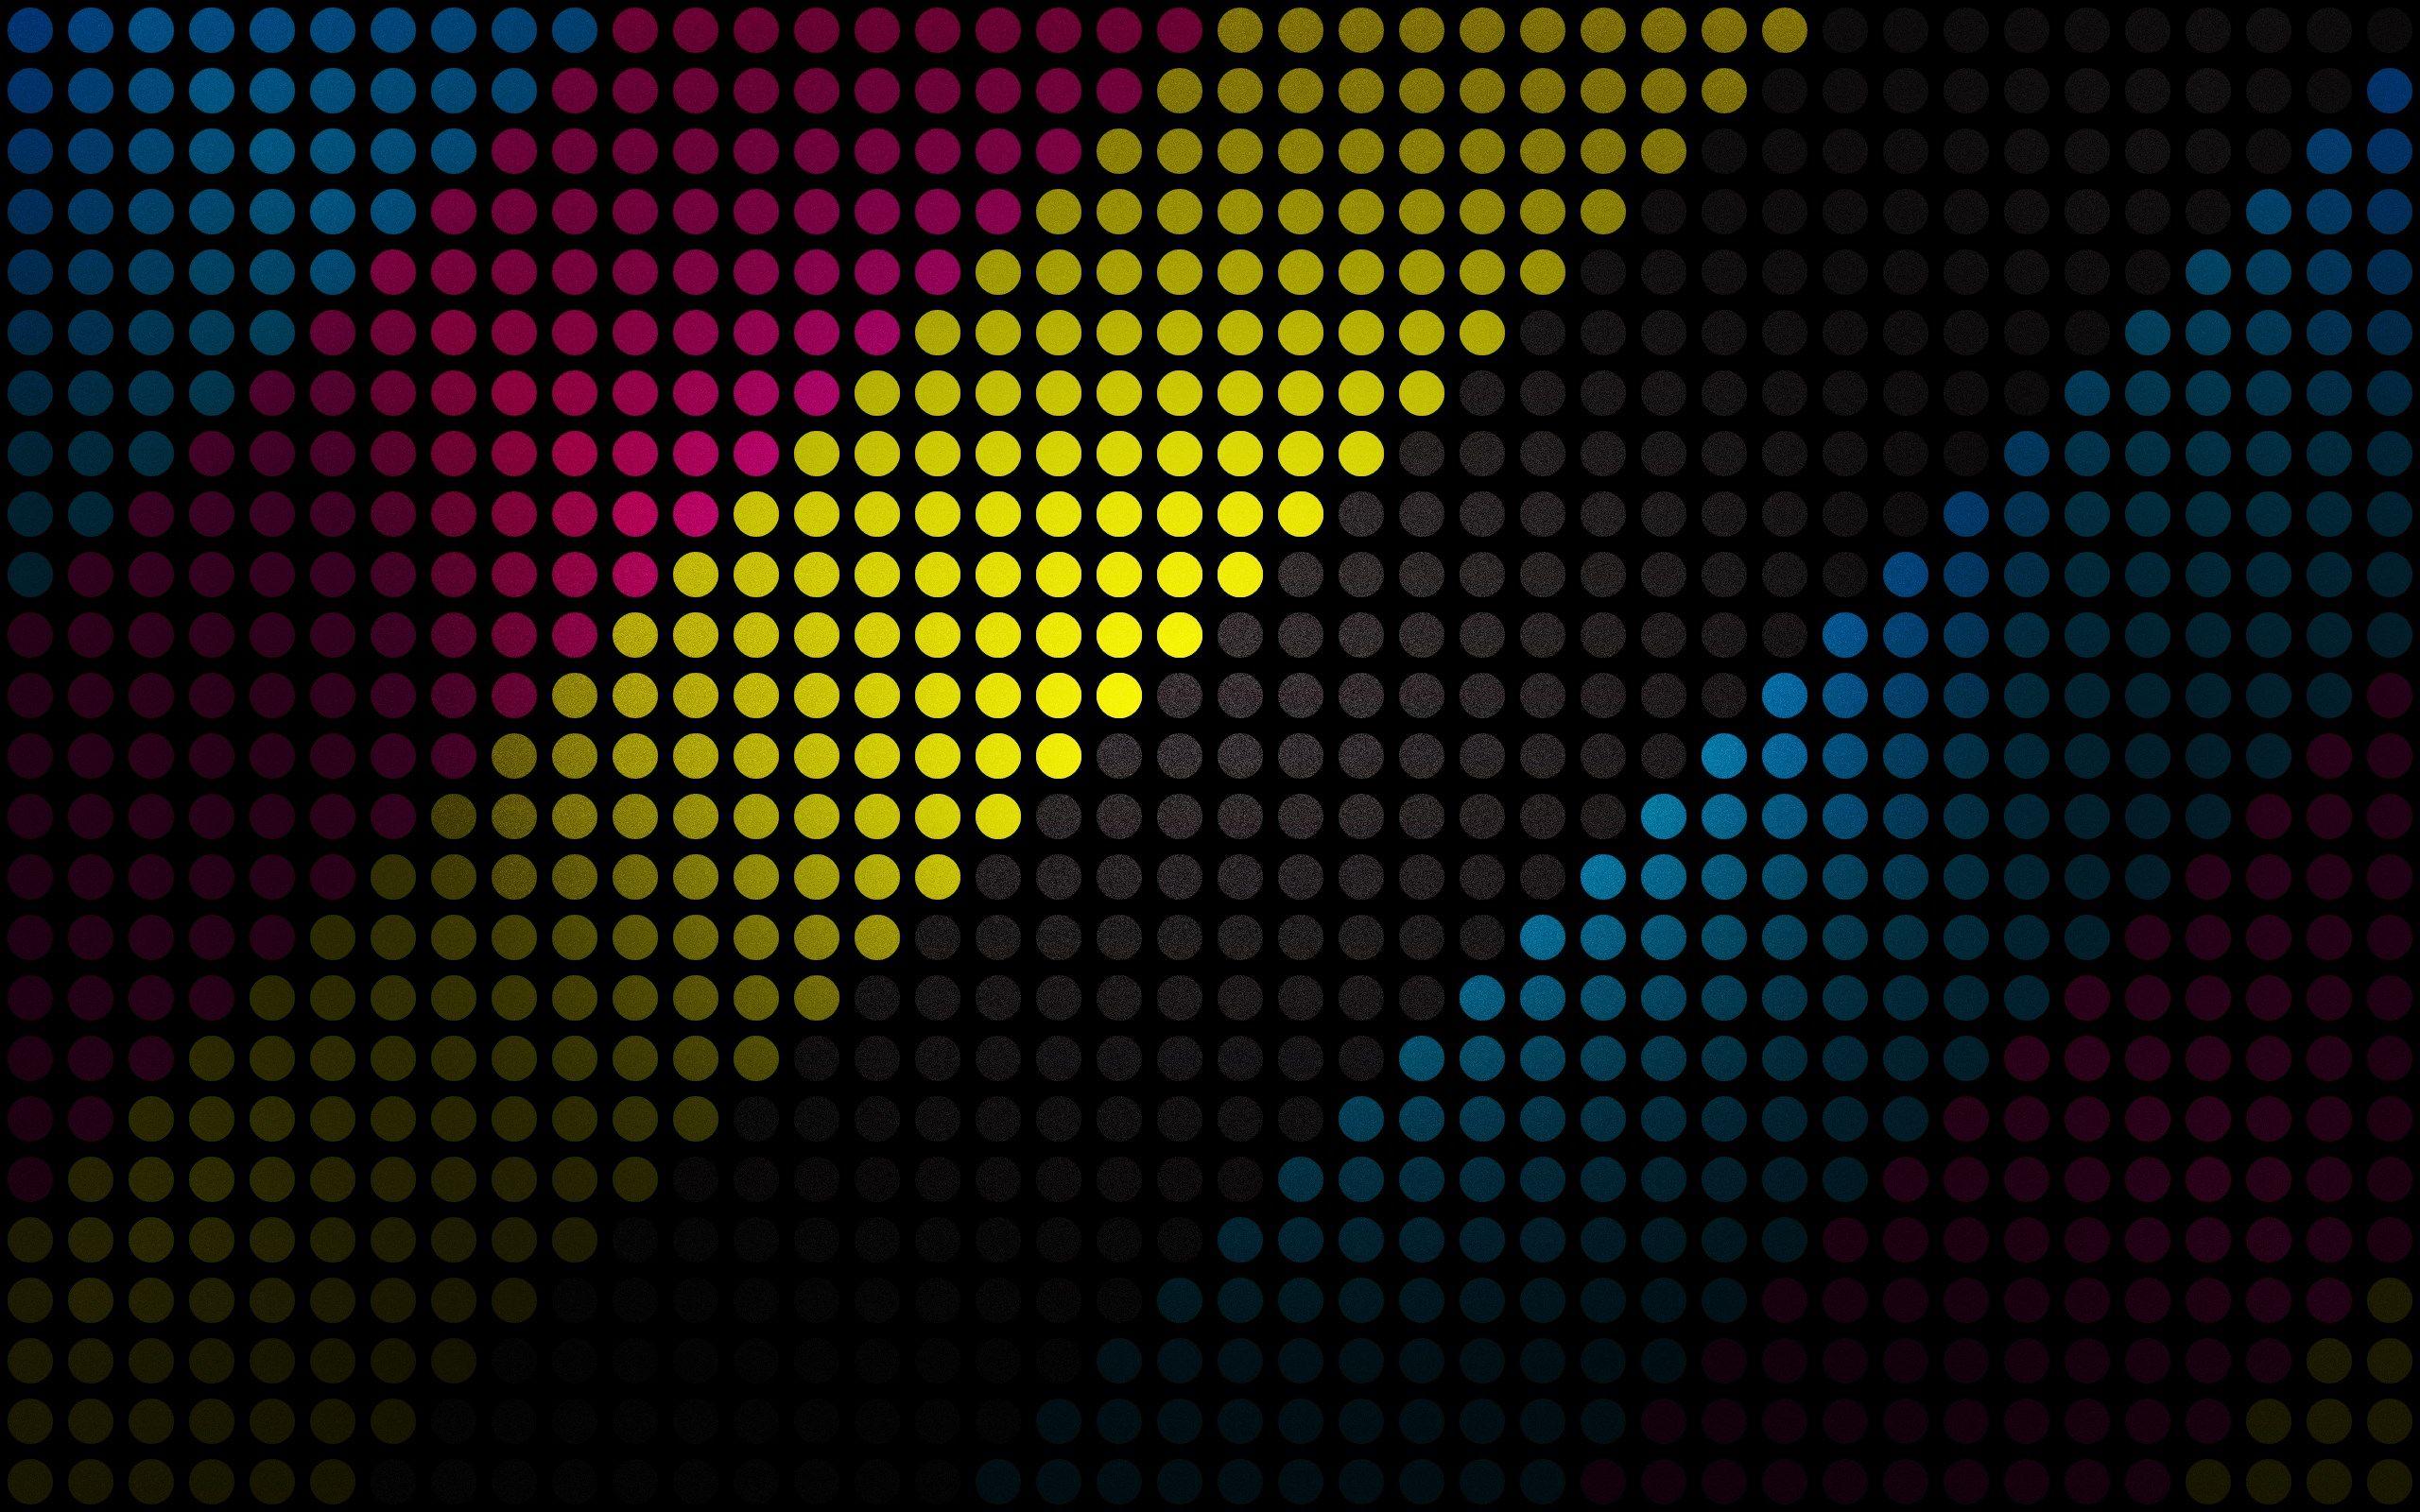 free hd cool desktop backgrounds designs ololoshenka Pinterest